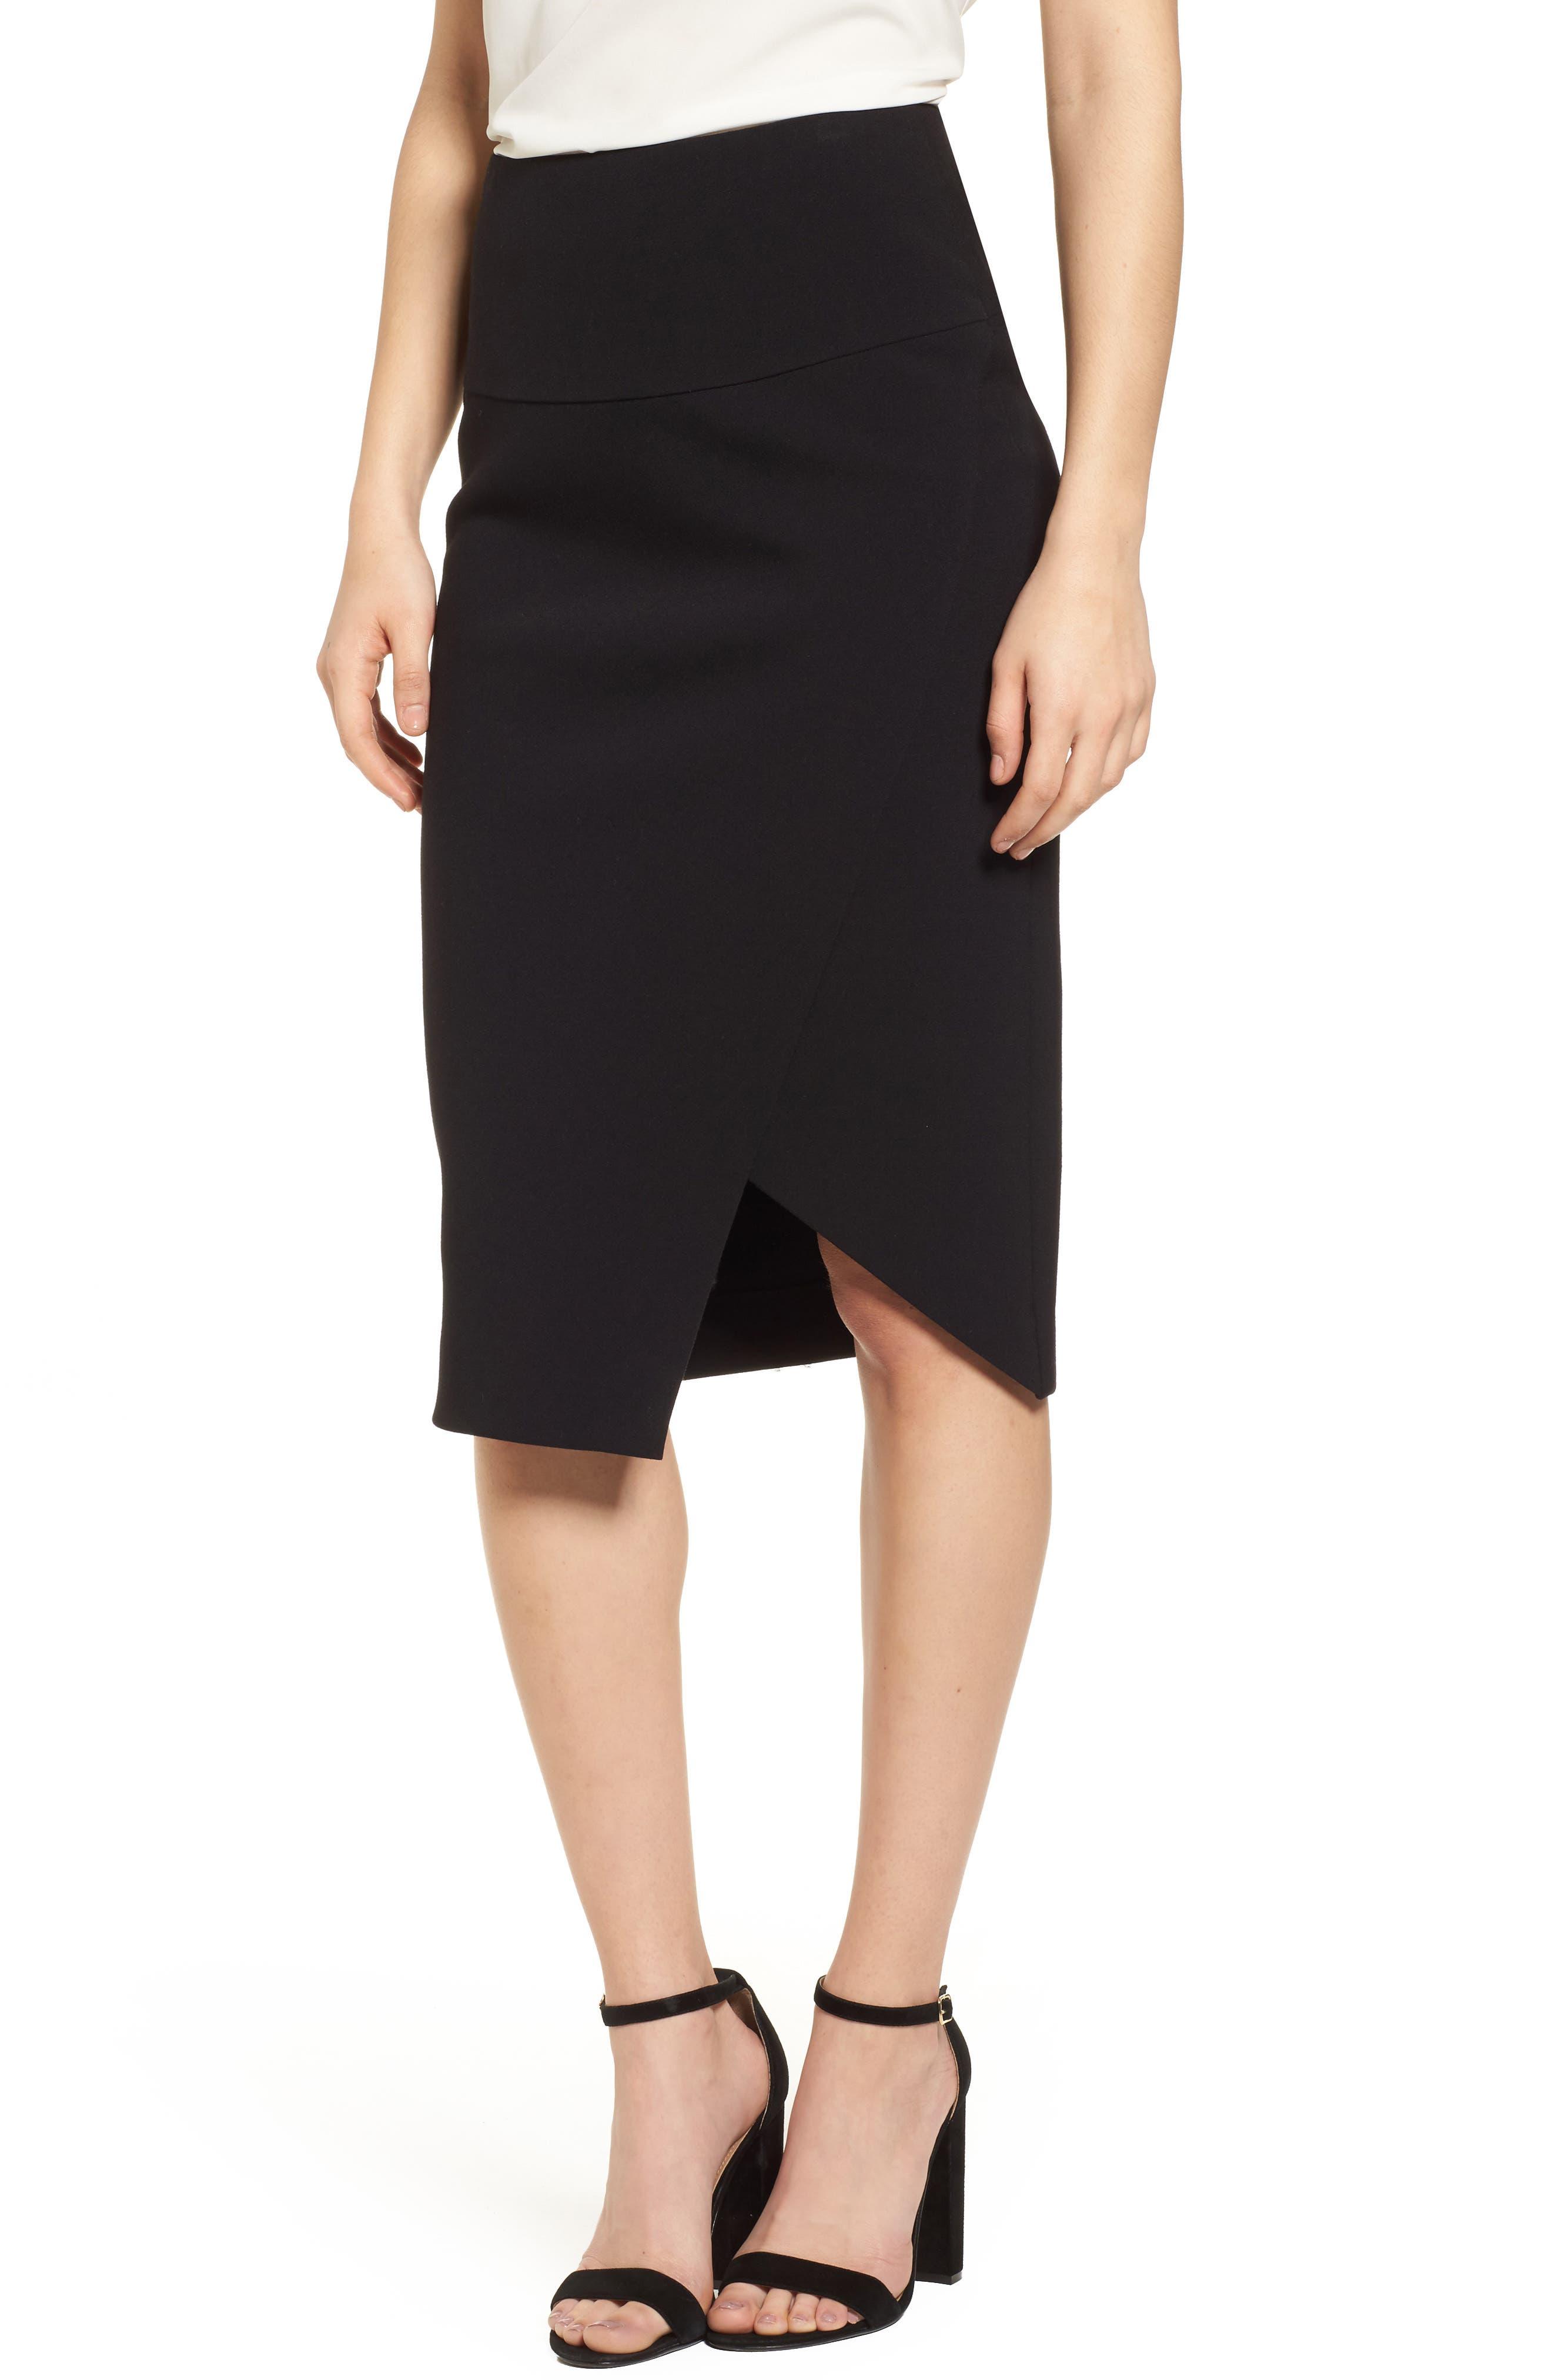 Emerson Rose Asymmetrical Pencil Skirt